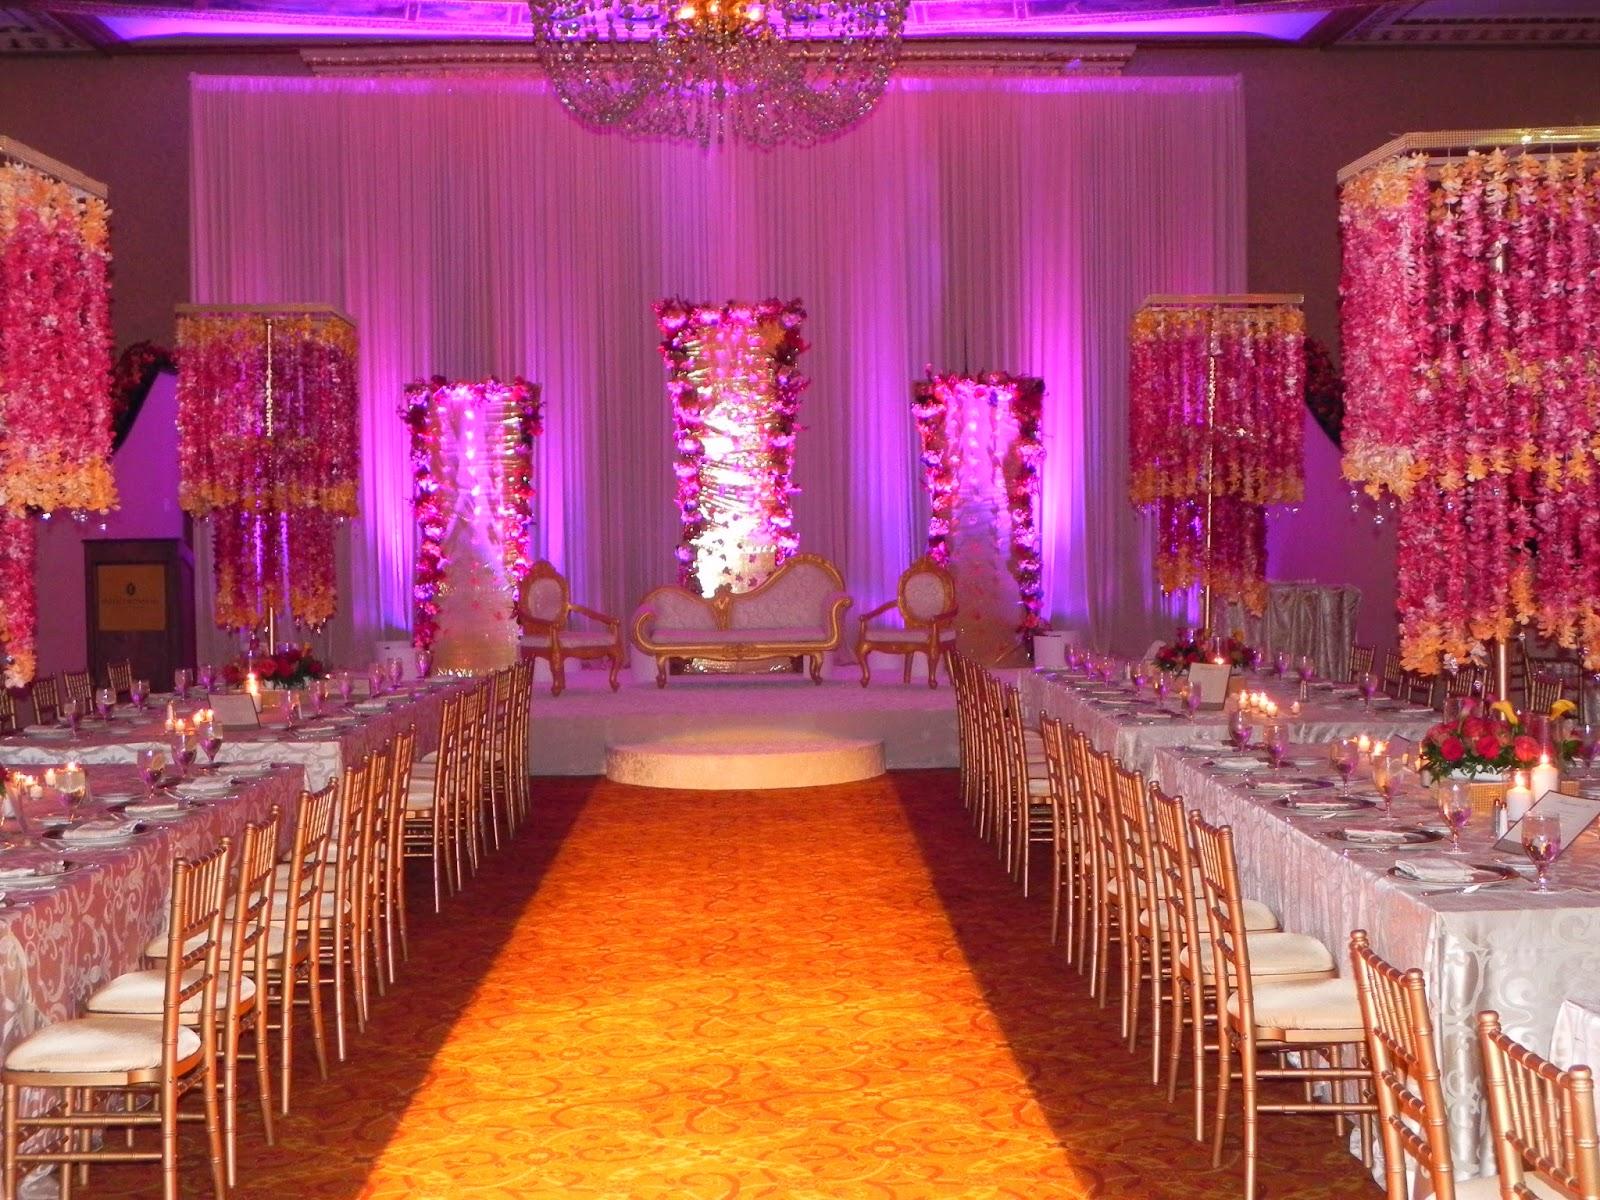 Oliveairé - Artisan Events and Meetings: Khan & Khawaja Wedding ...